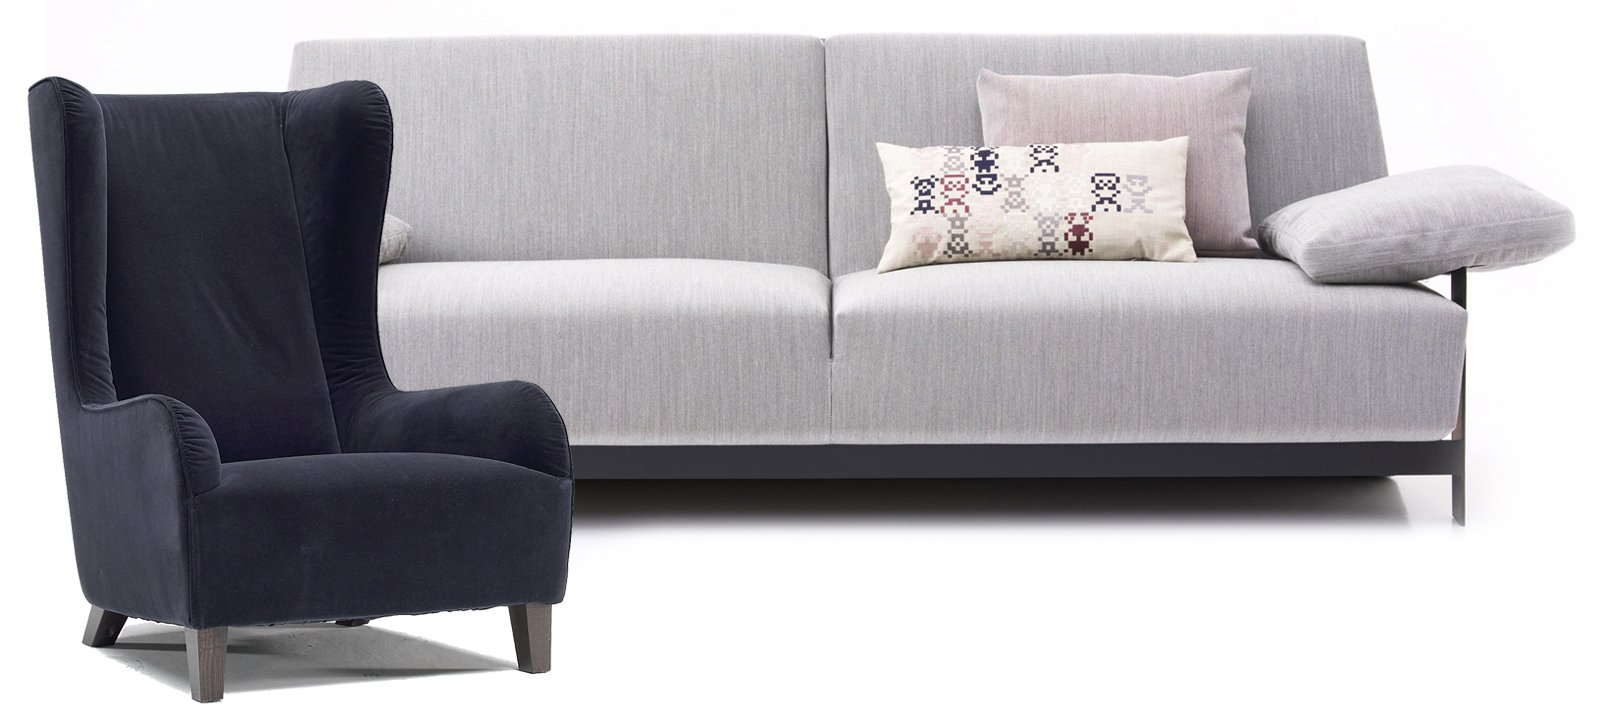 divano ? pagina 3 ? stilopolis. divani a due posti (foto 2 ...